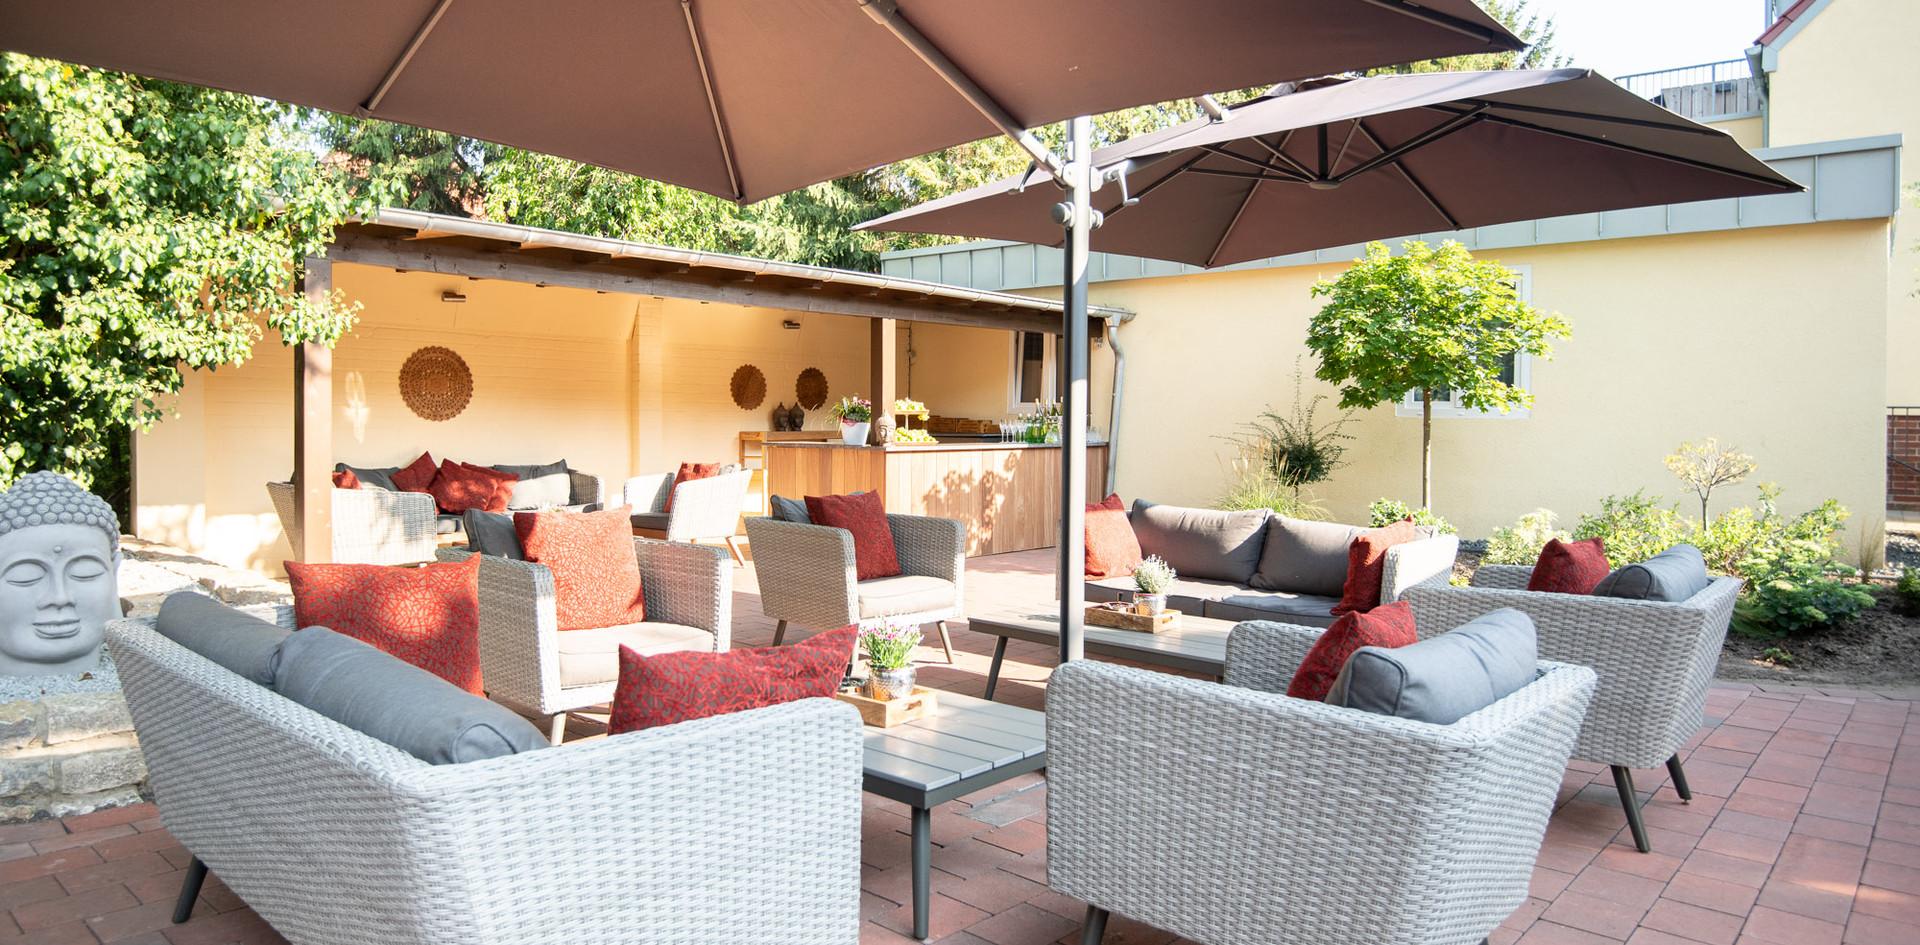 Lounge Bereich Gartenterrasse Hotel Wegner - the culinary art hotel